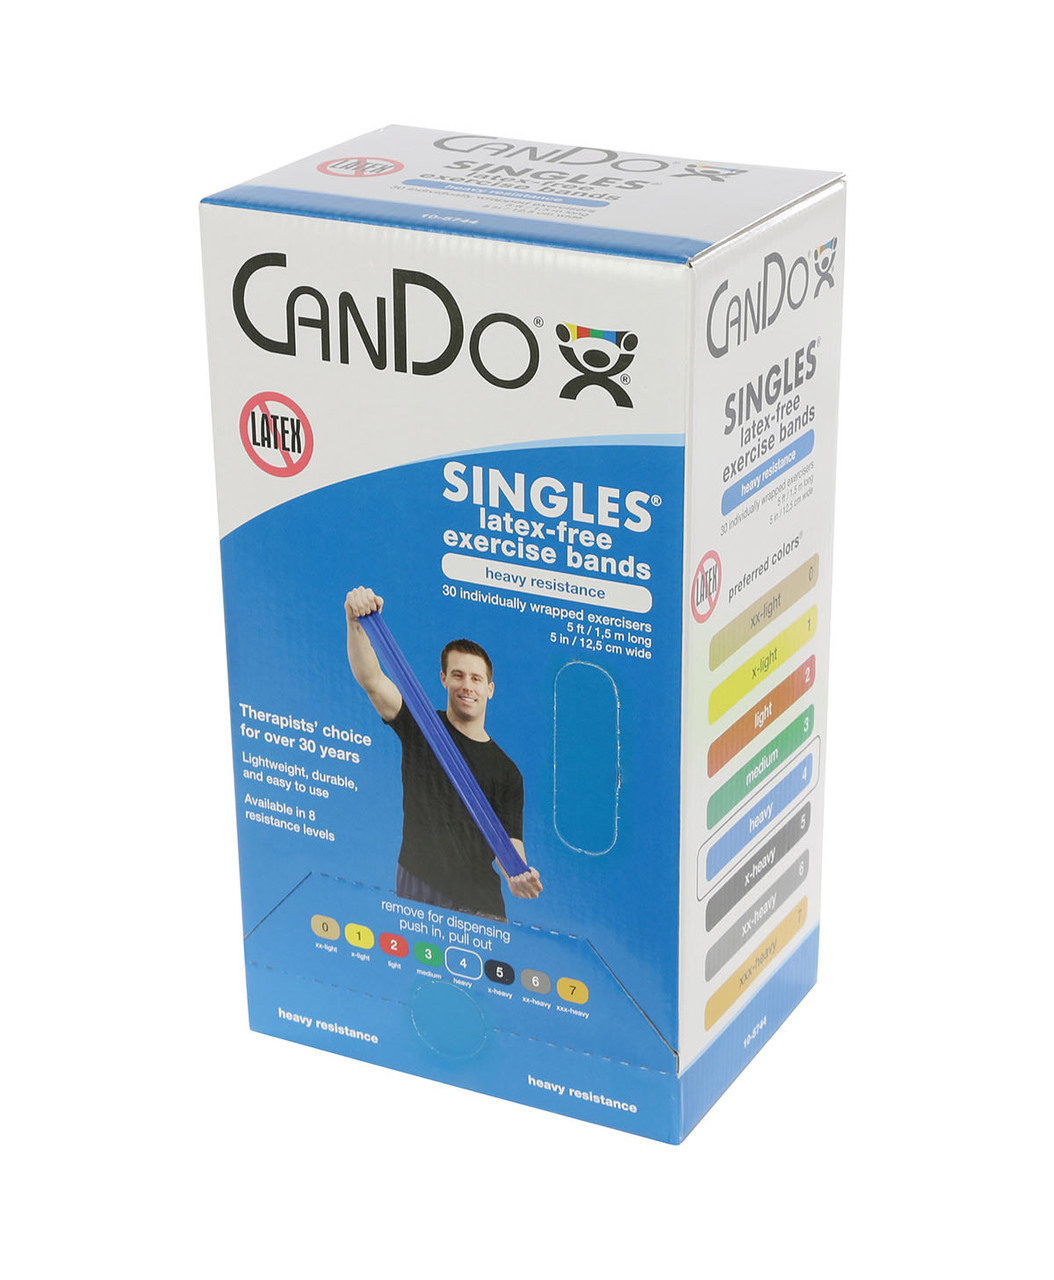 CanDo Latex Free Exercise Band box of 30, 5' length Blue heavy